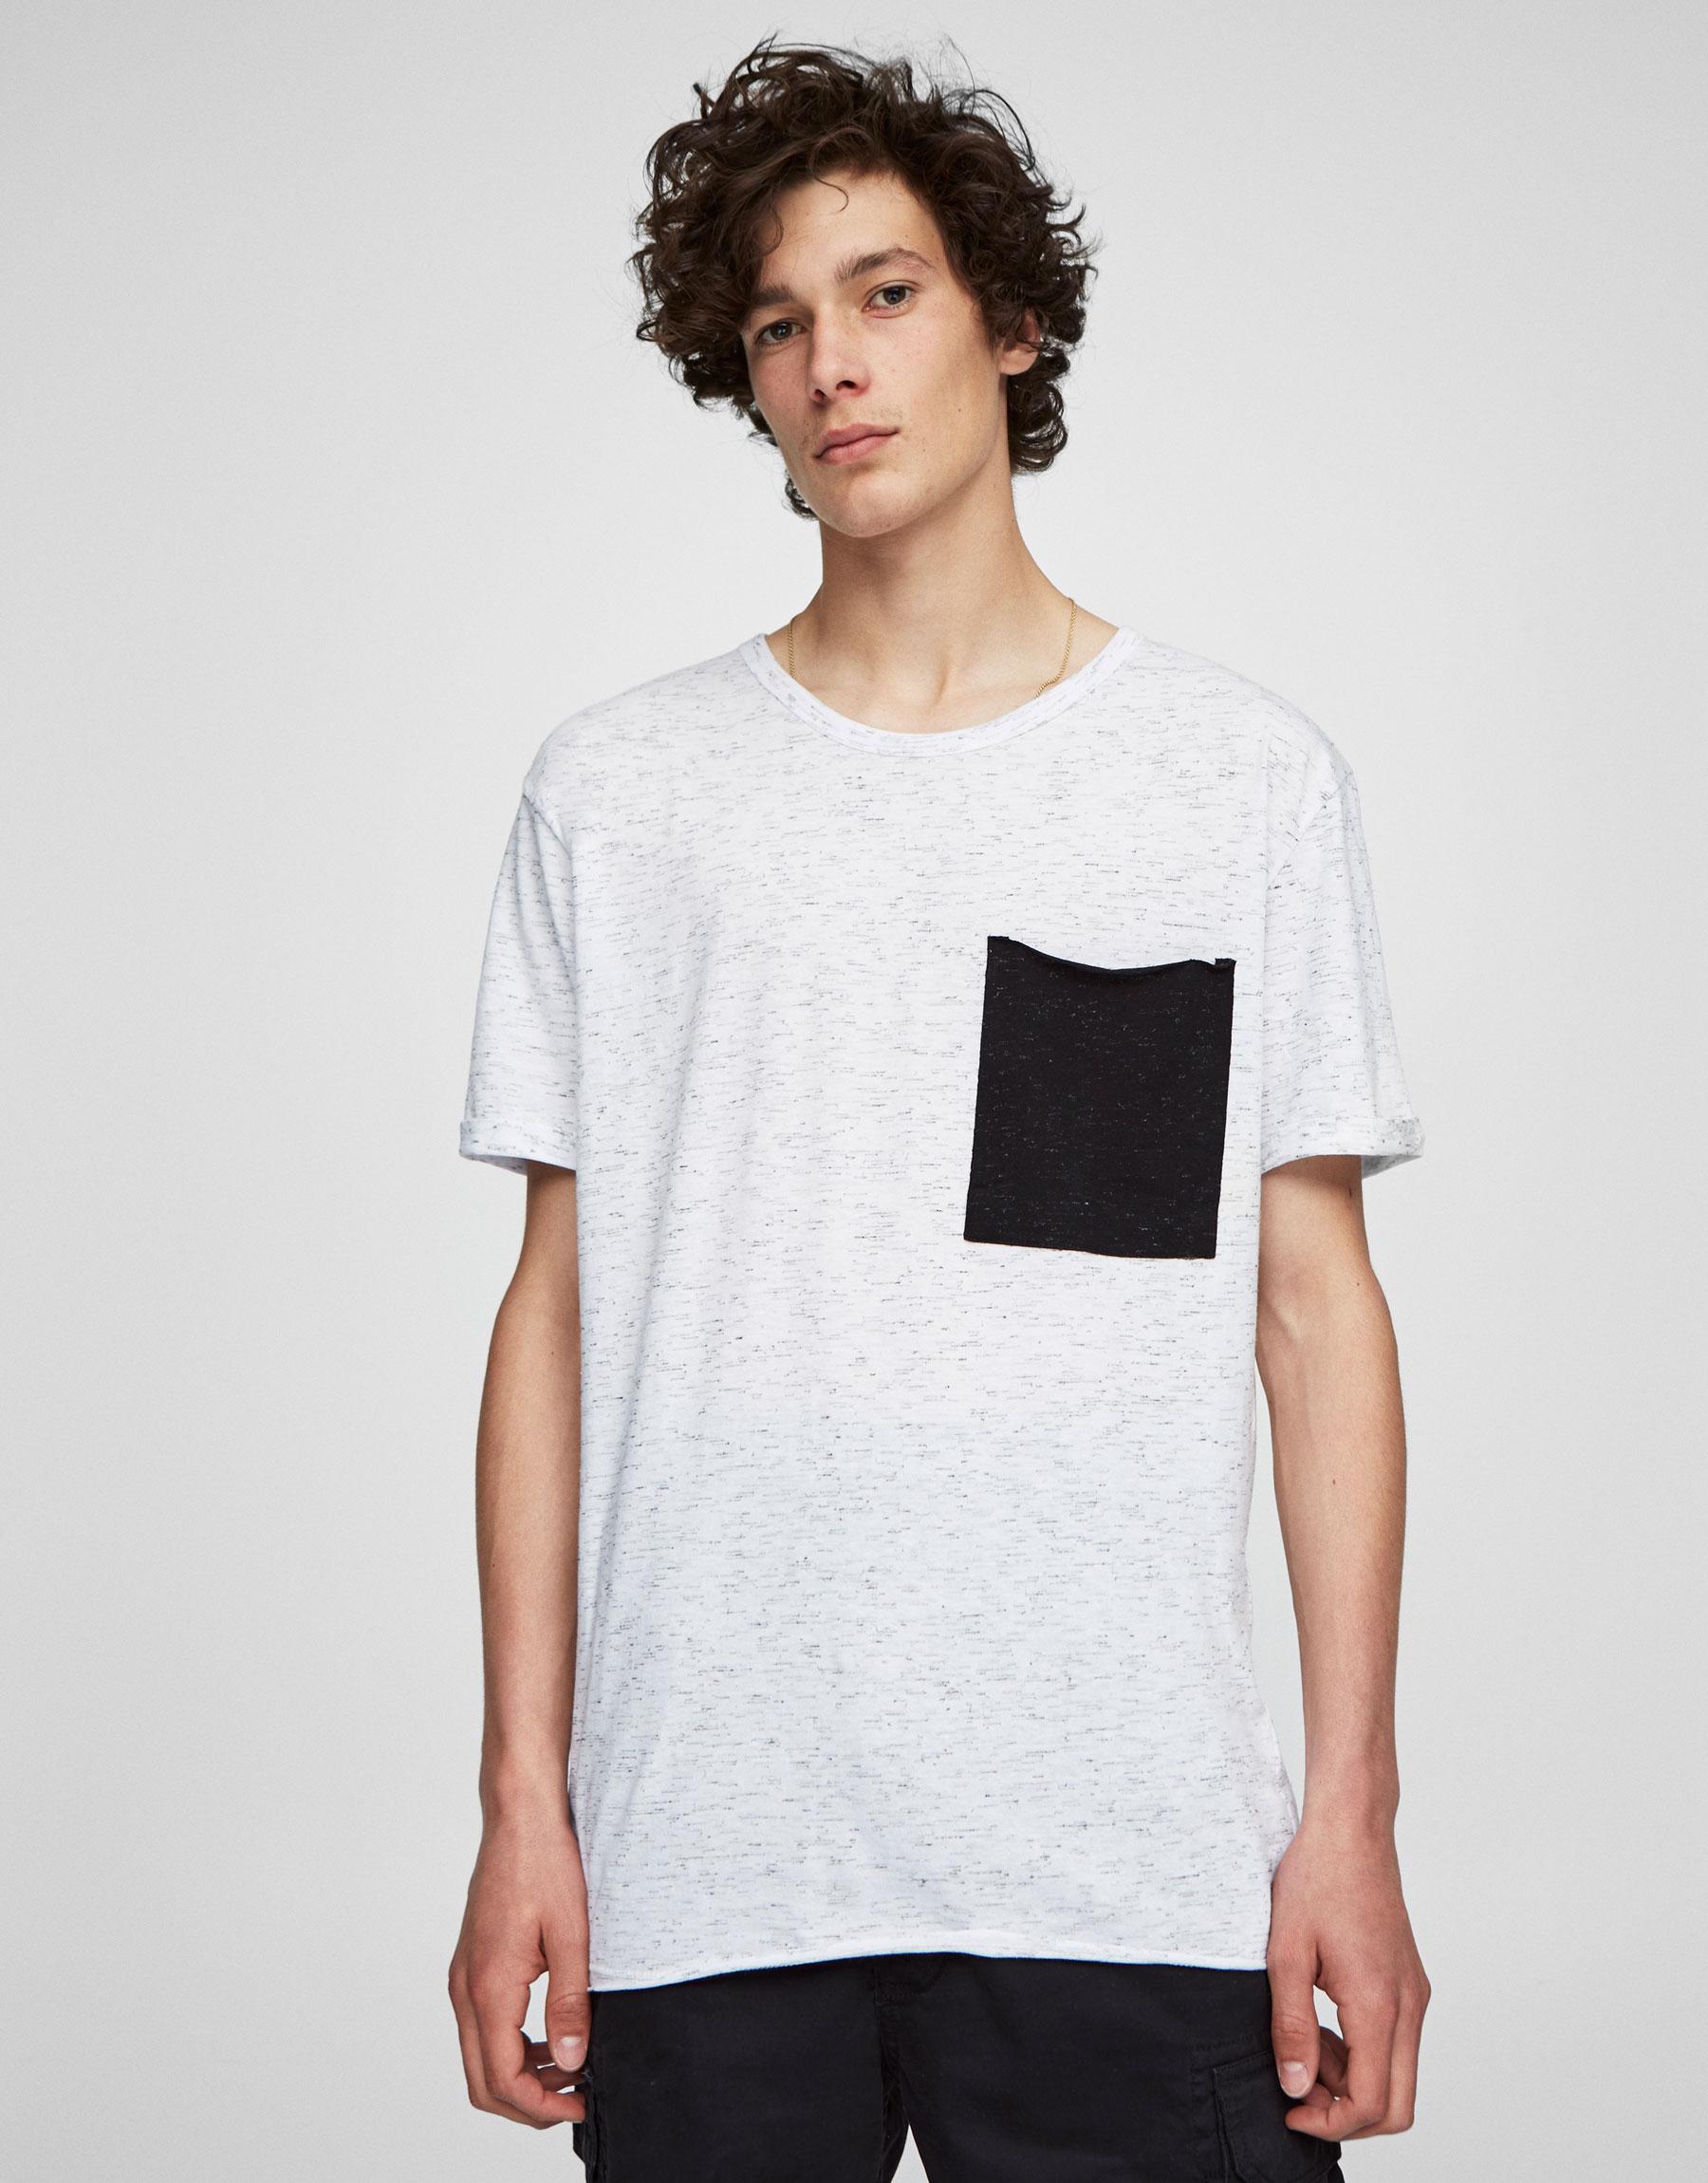 Camiseta bolsillo contraste